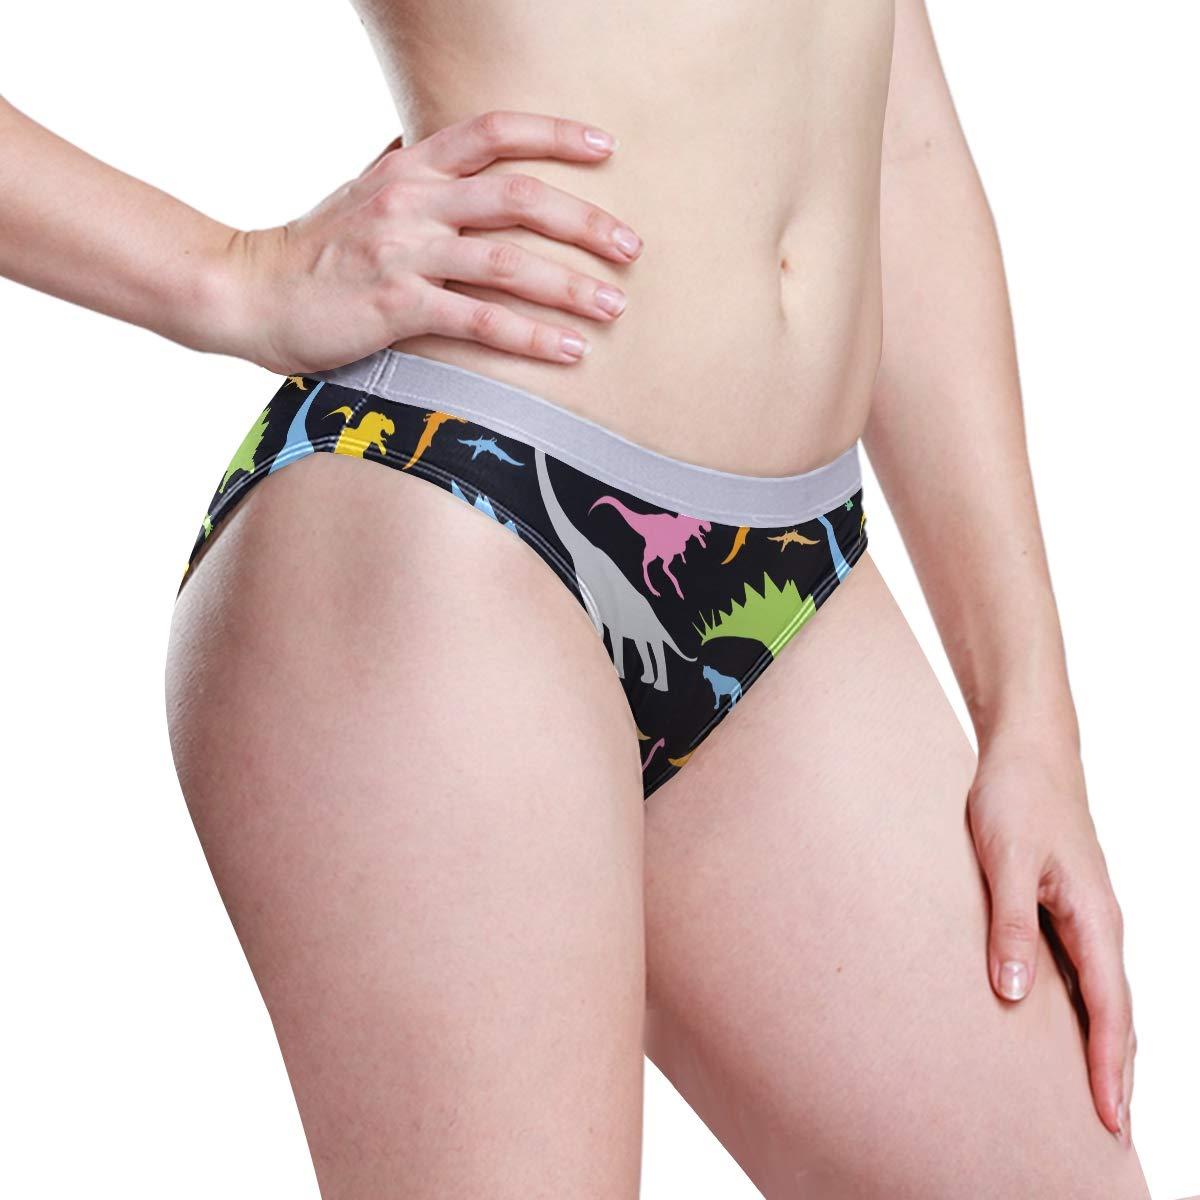 FAJRO Colorful Animal Dinosaurs Party Womens Low-Rise Underwear Panties Spandex